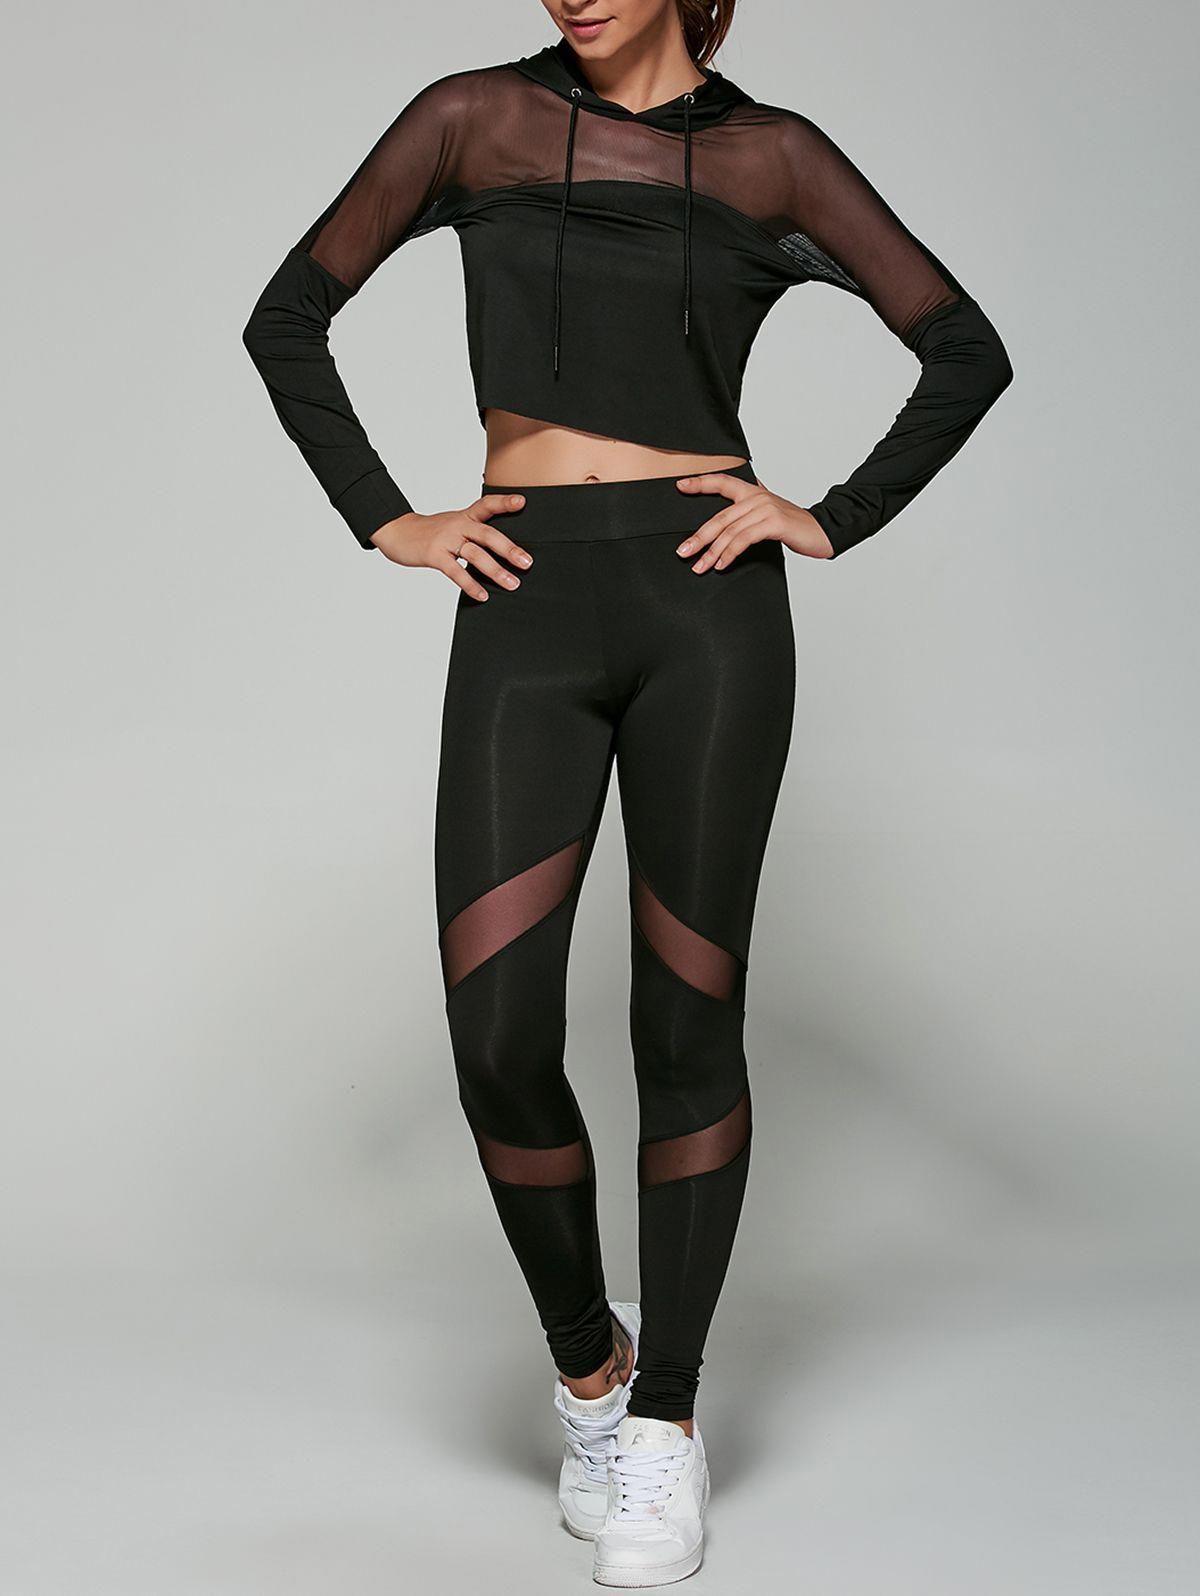 770ebb75f3491 shop leggings | Leggings in 2019 | Womens workout outfits, Mesh ...